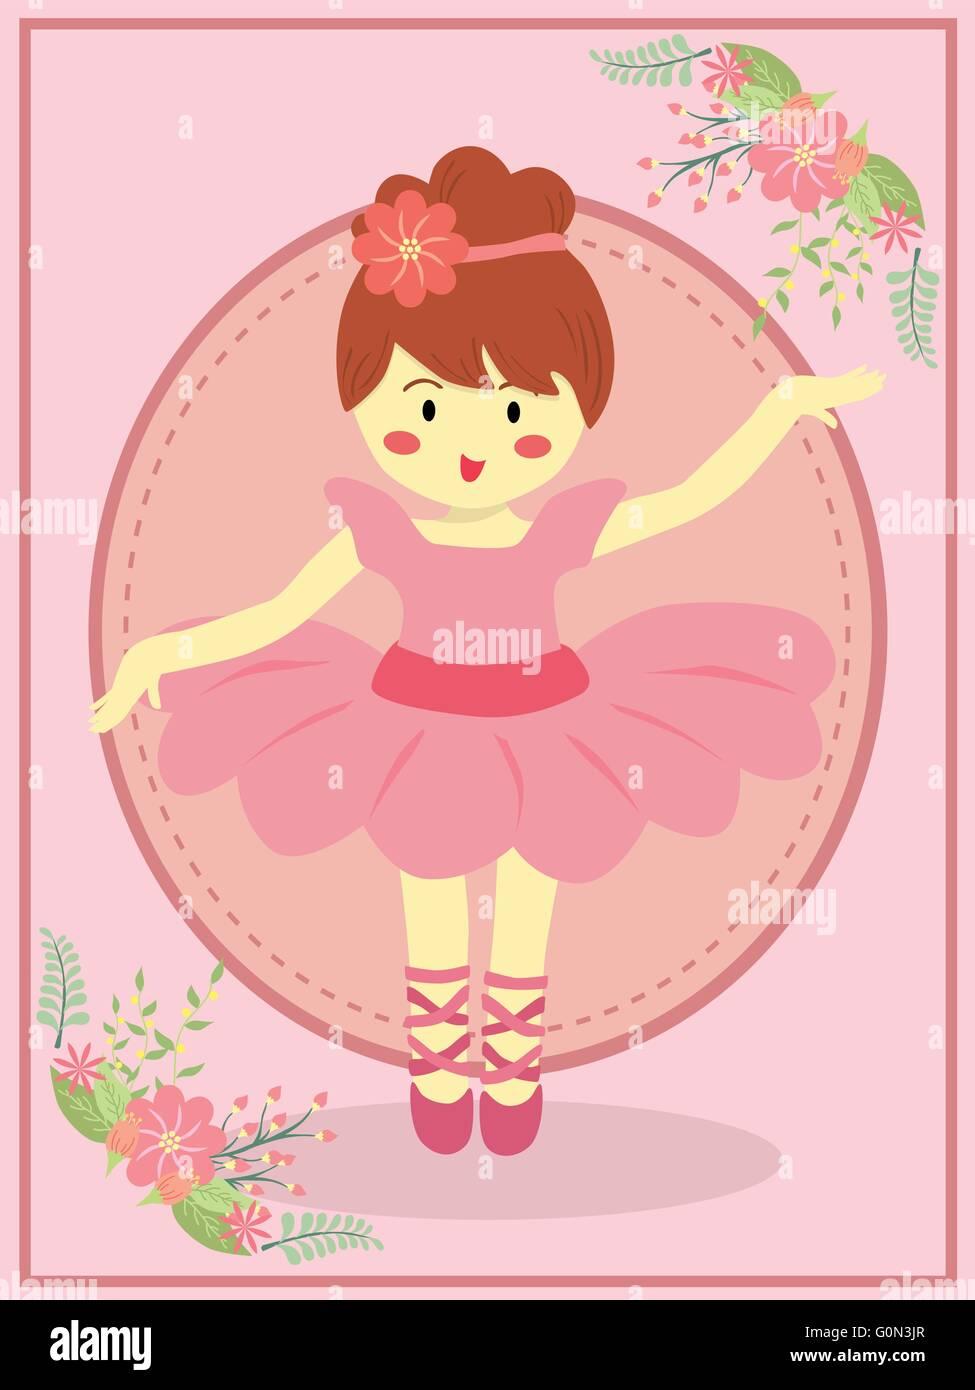 4a0560a0c921 Cute ballerina girl with pink dress tutu dancing ballet in pink ...